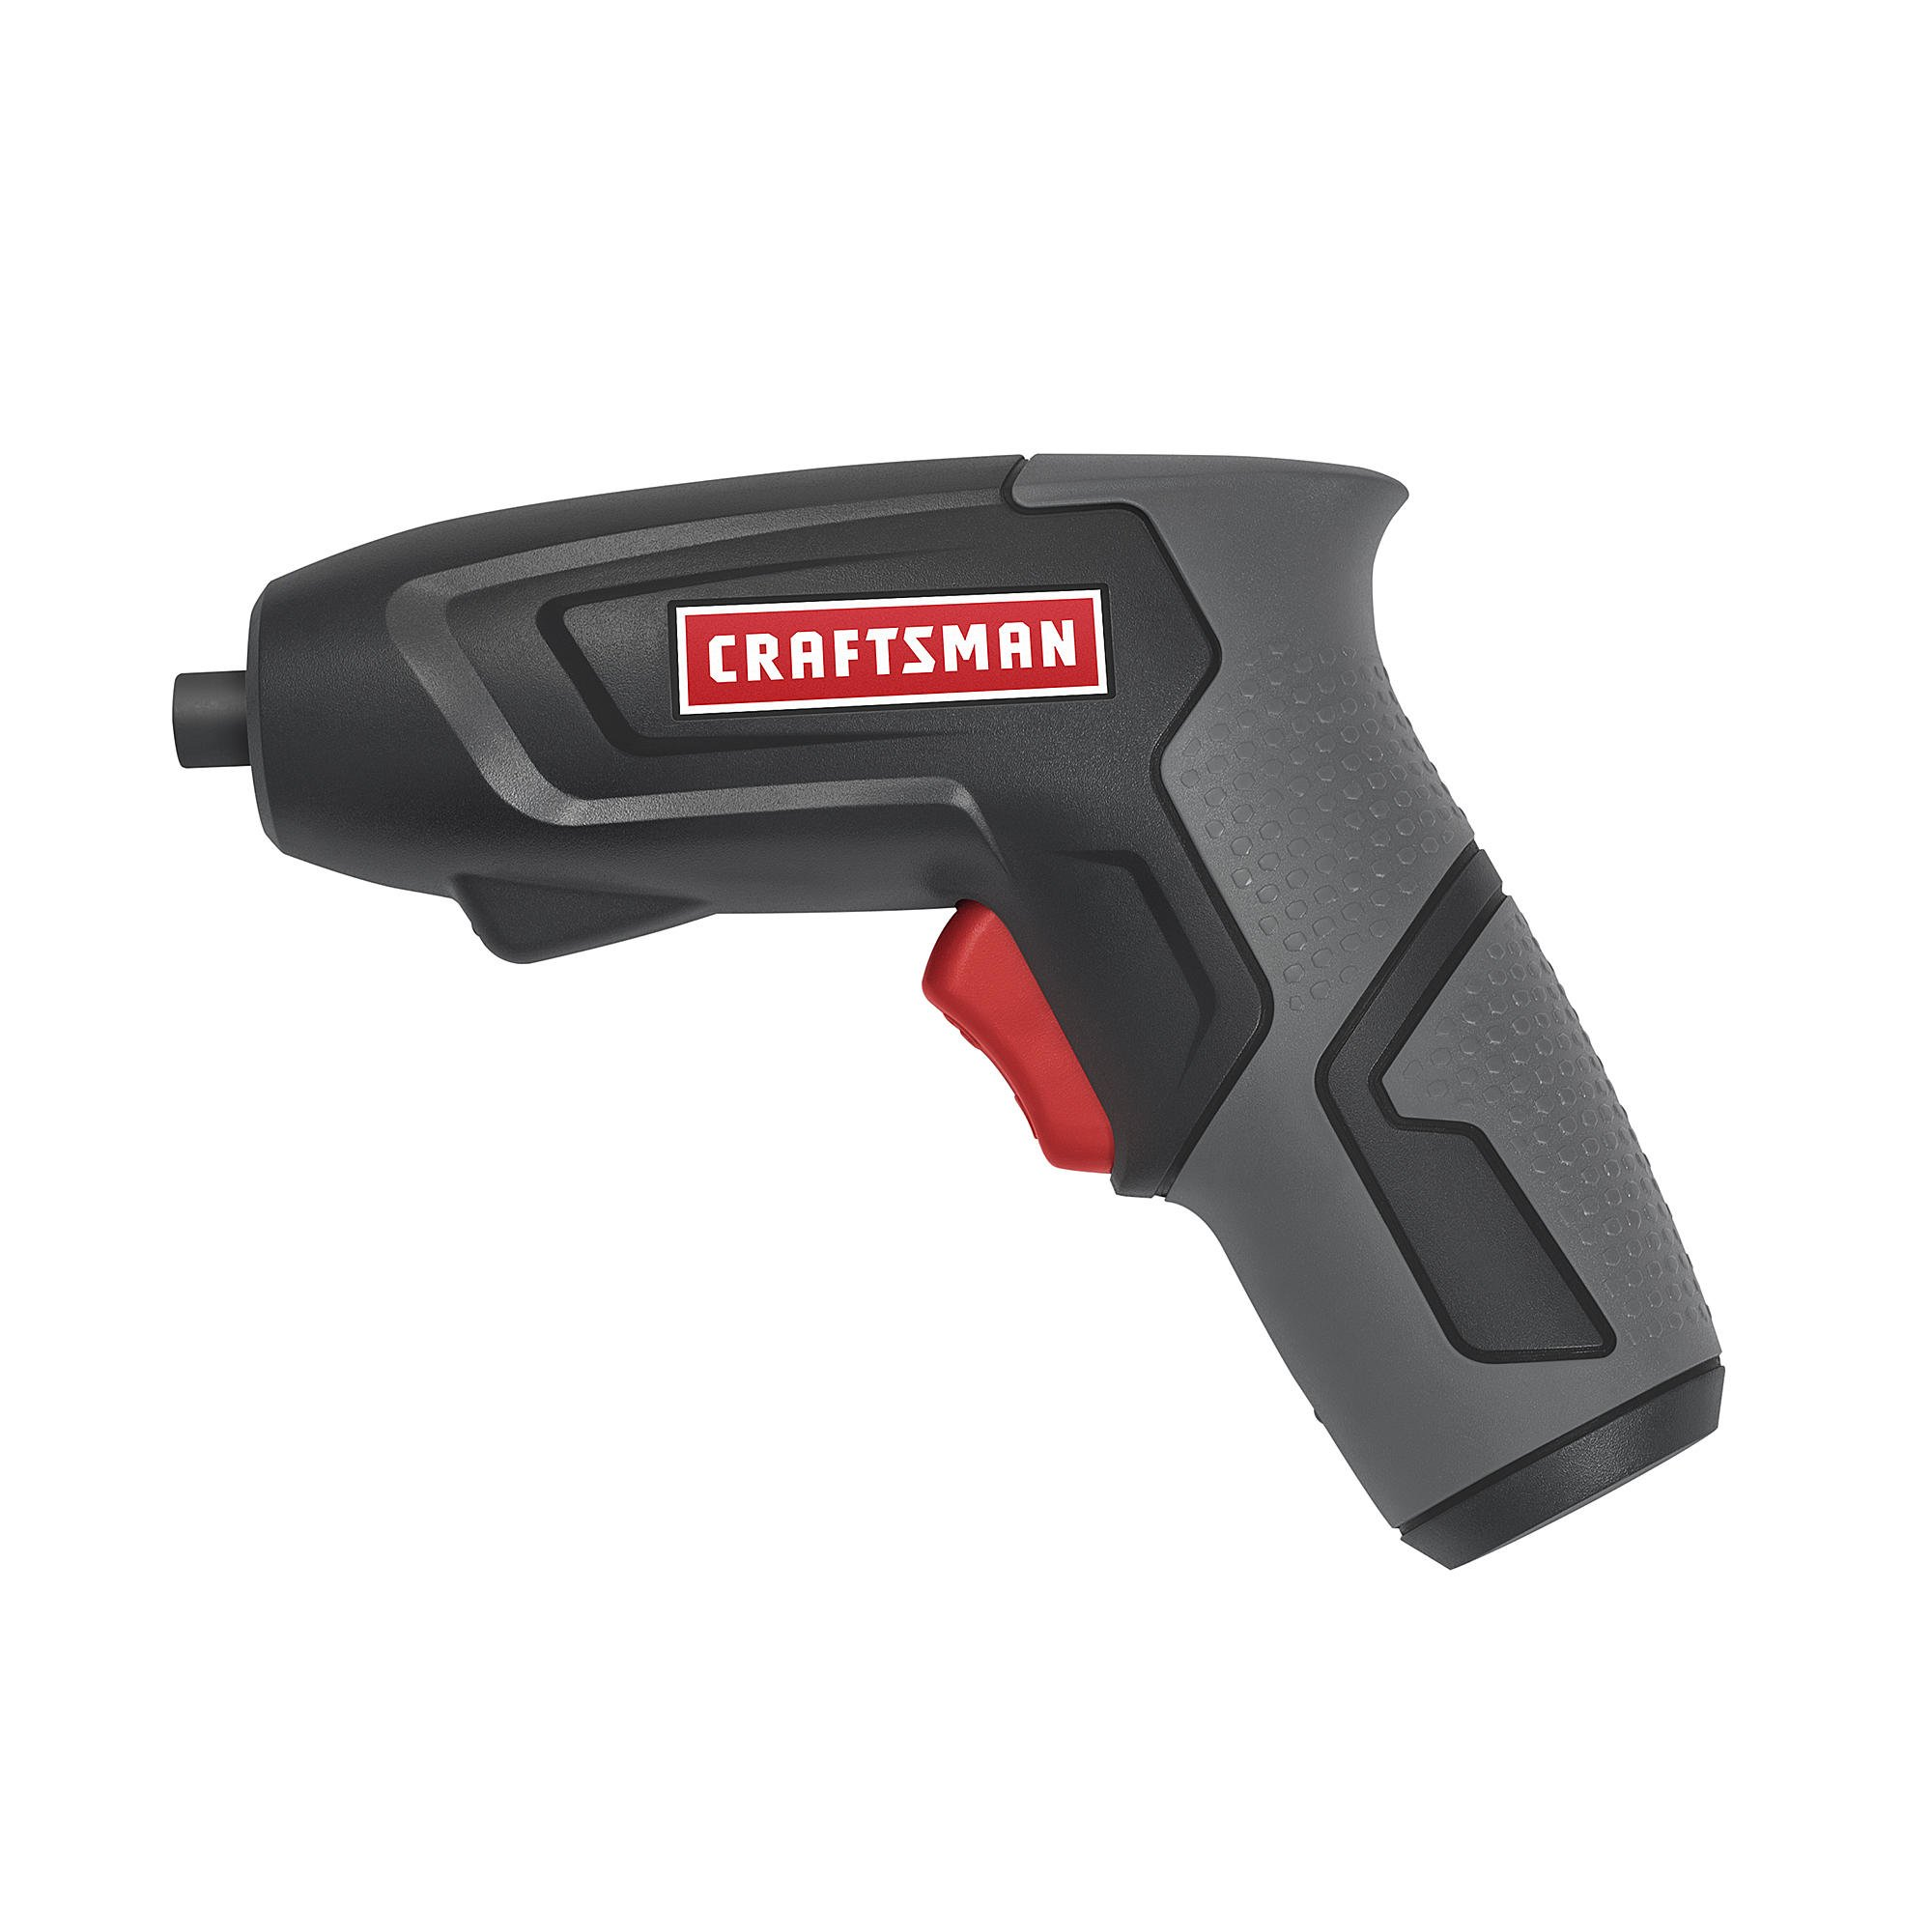 Craftsman 4 Volt Cordless Rechargeable Screwdriver 941770 4V 1.5ah